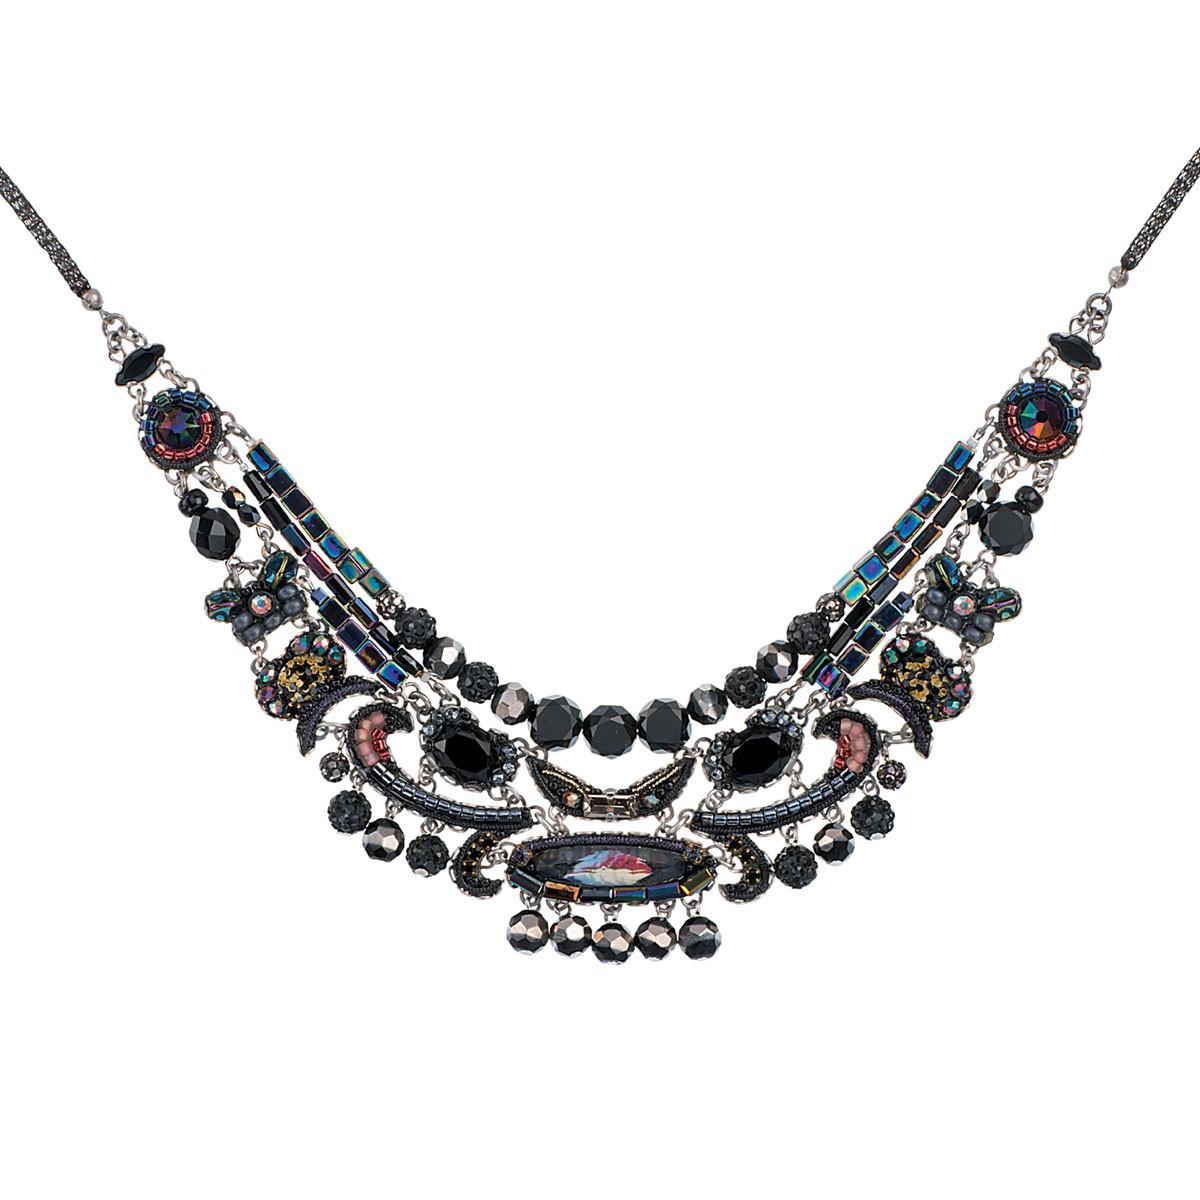 Black Ayala Bar Jewelry Blacktree Style Necklace